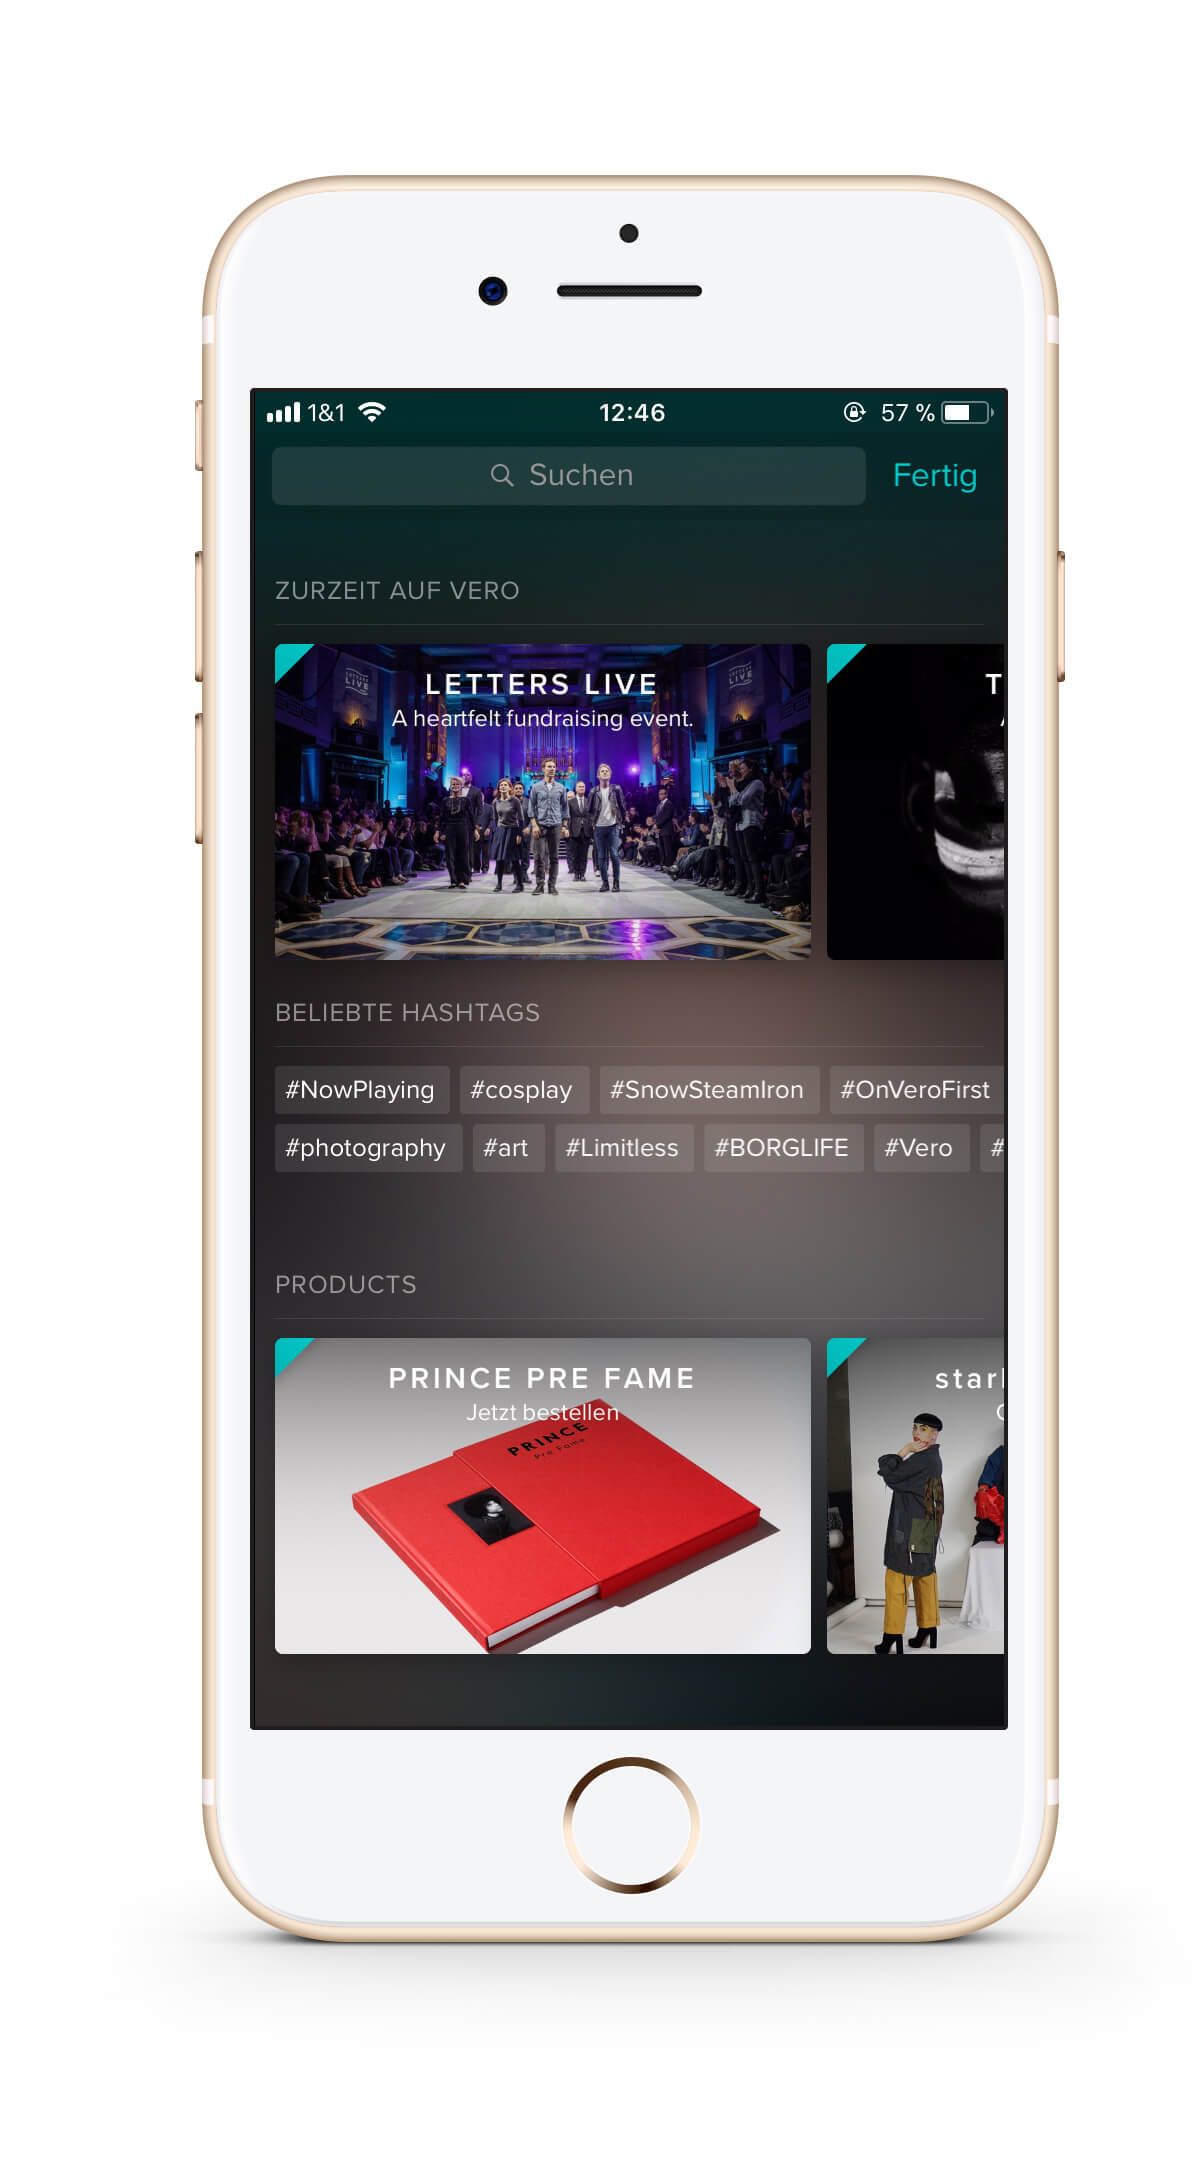 Instagram bekommt Konkurrenz - alles über die neue App VERO ...